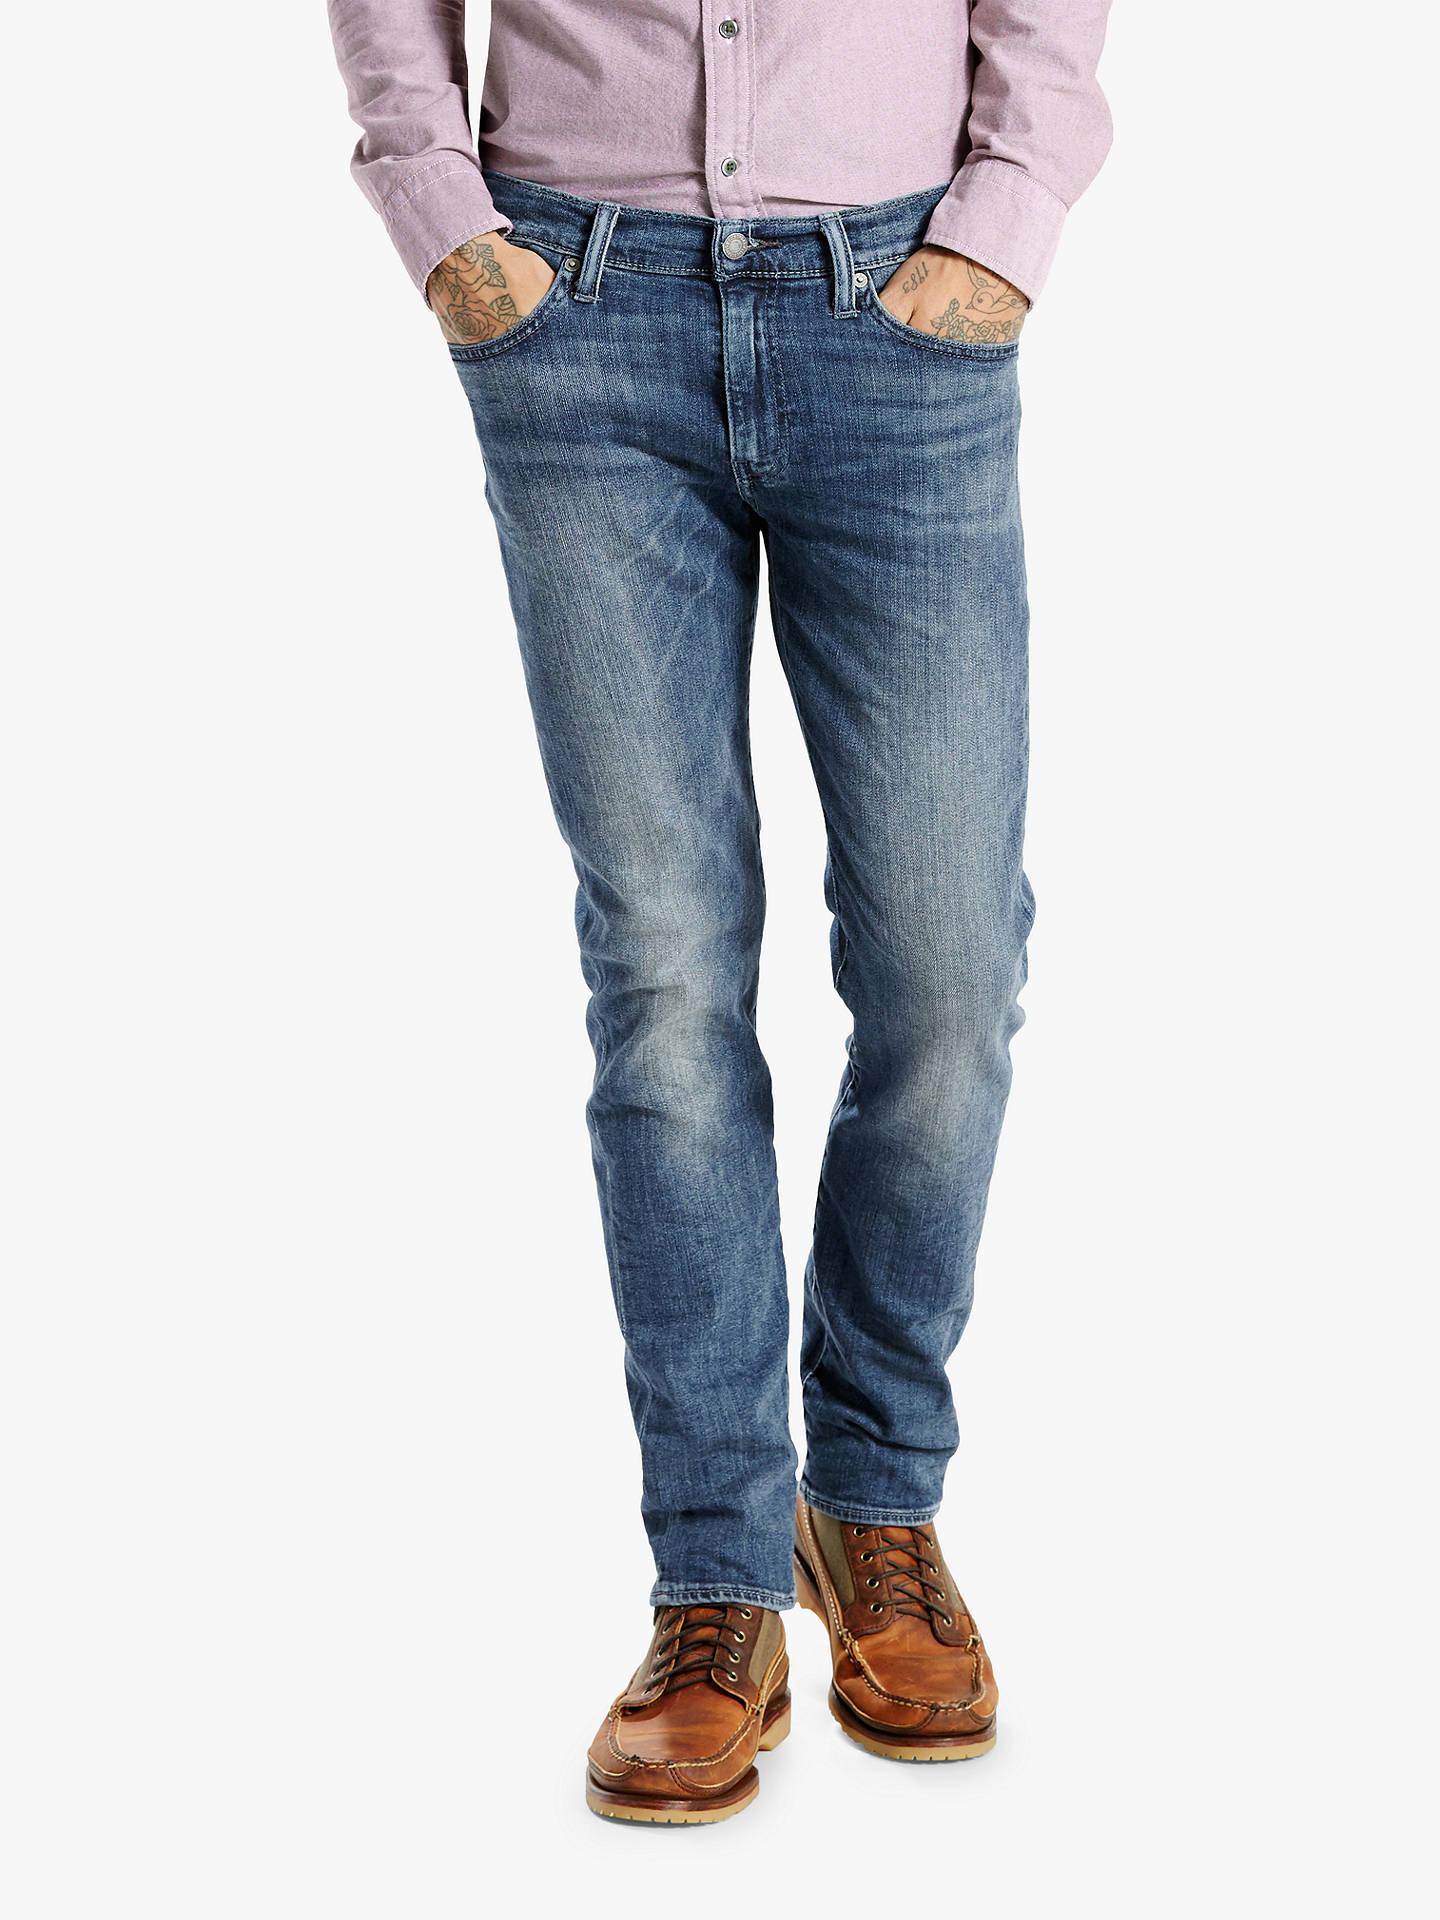 40238234b Buy Levi's 511 Slim Fit Jeans, Amor, 32S Online at johnlewis. ...